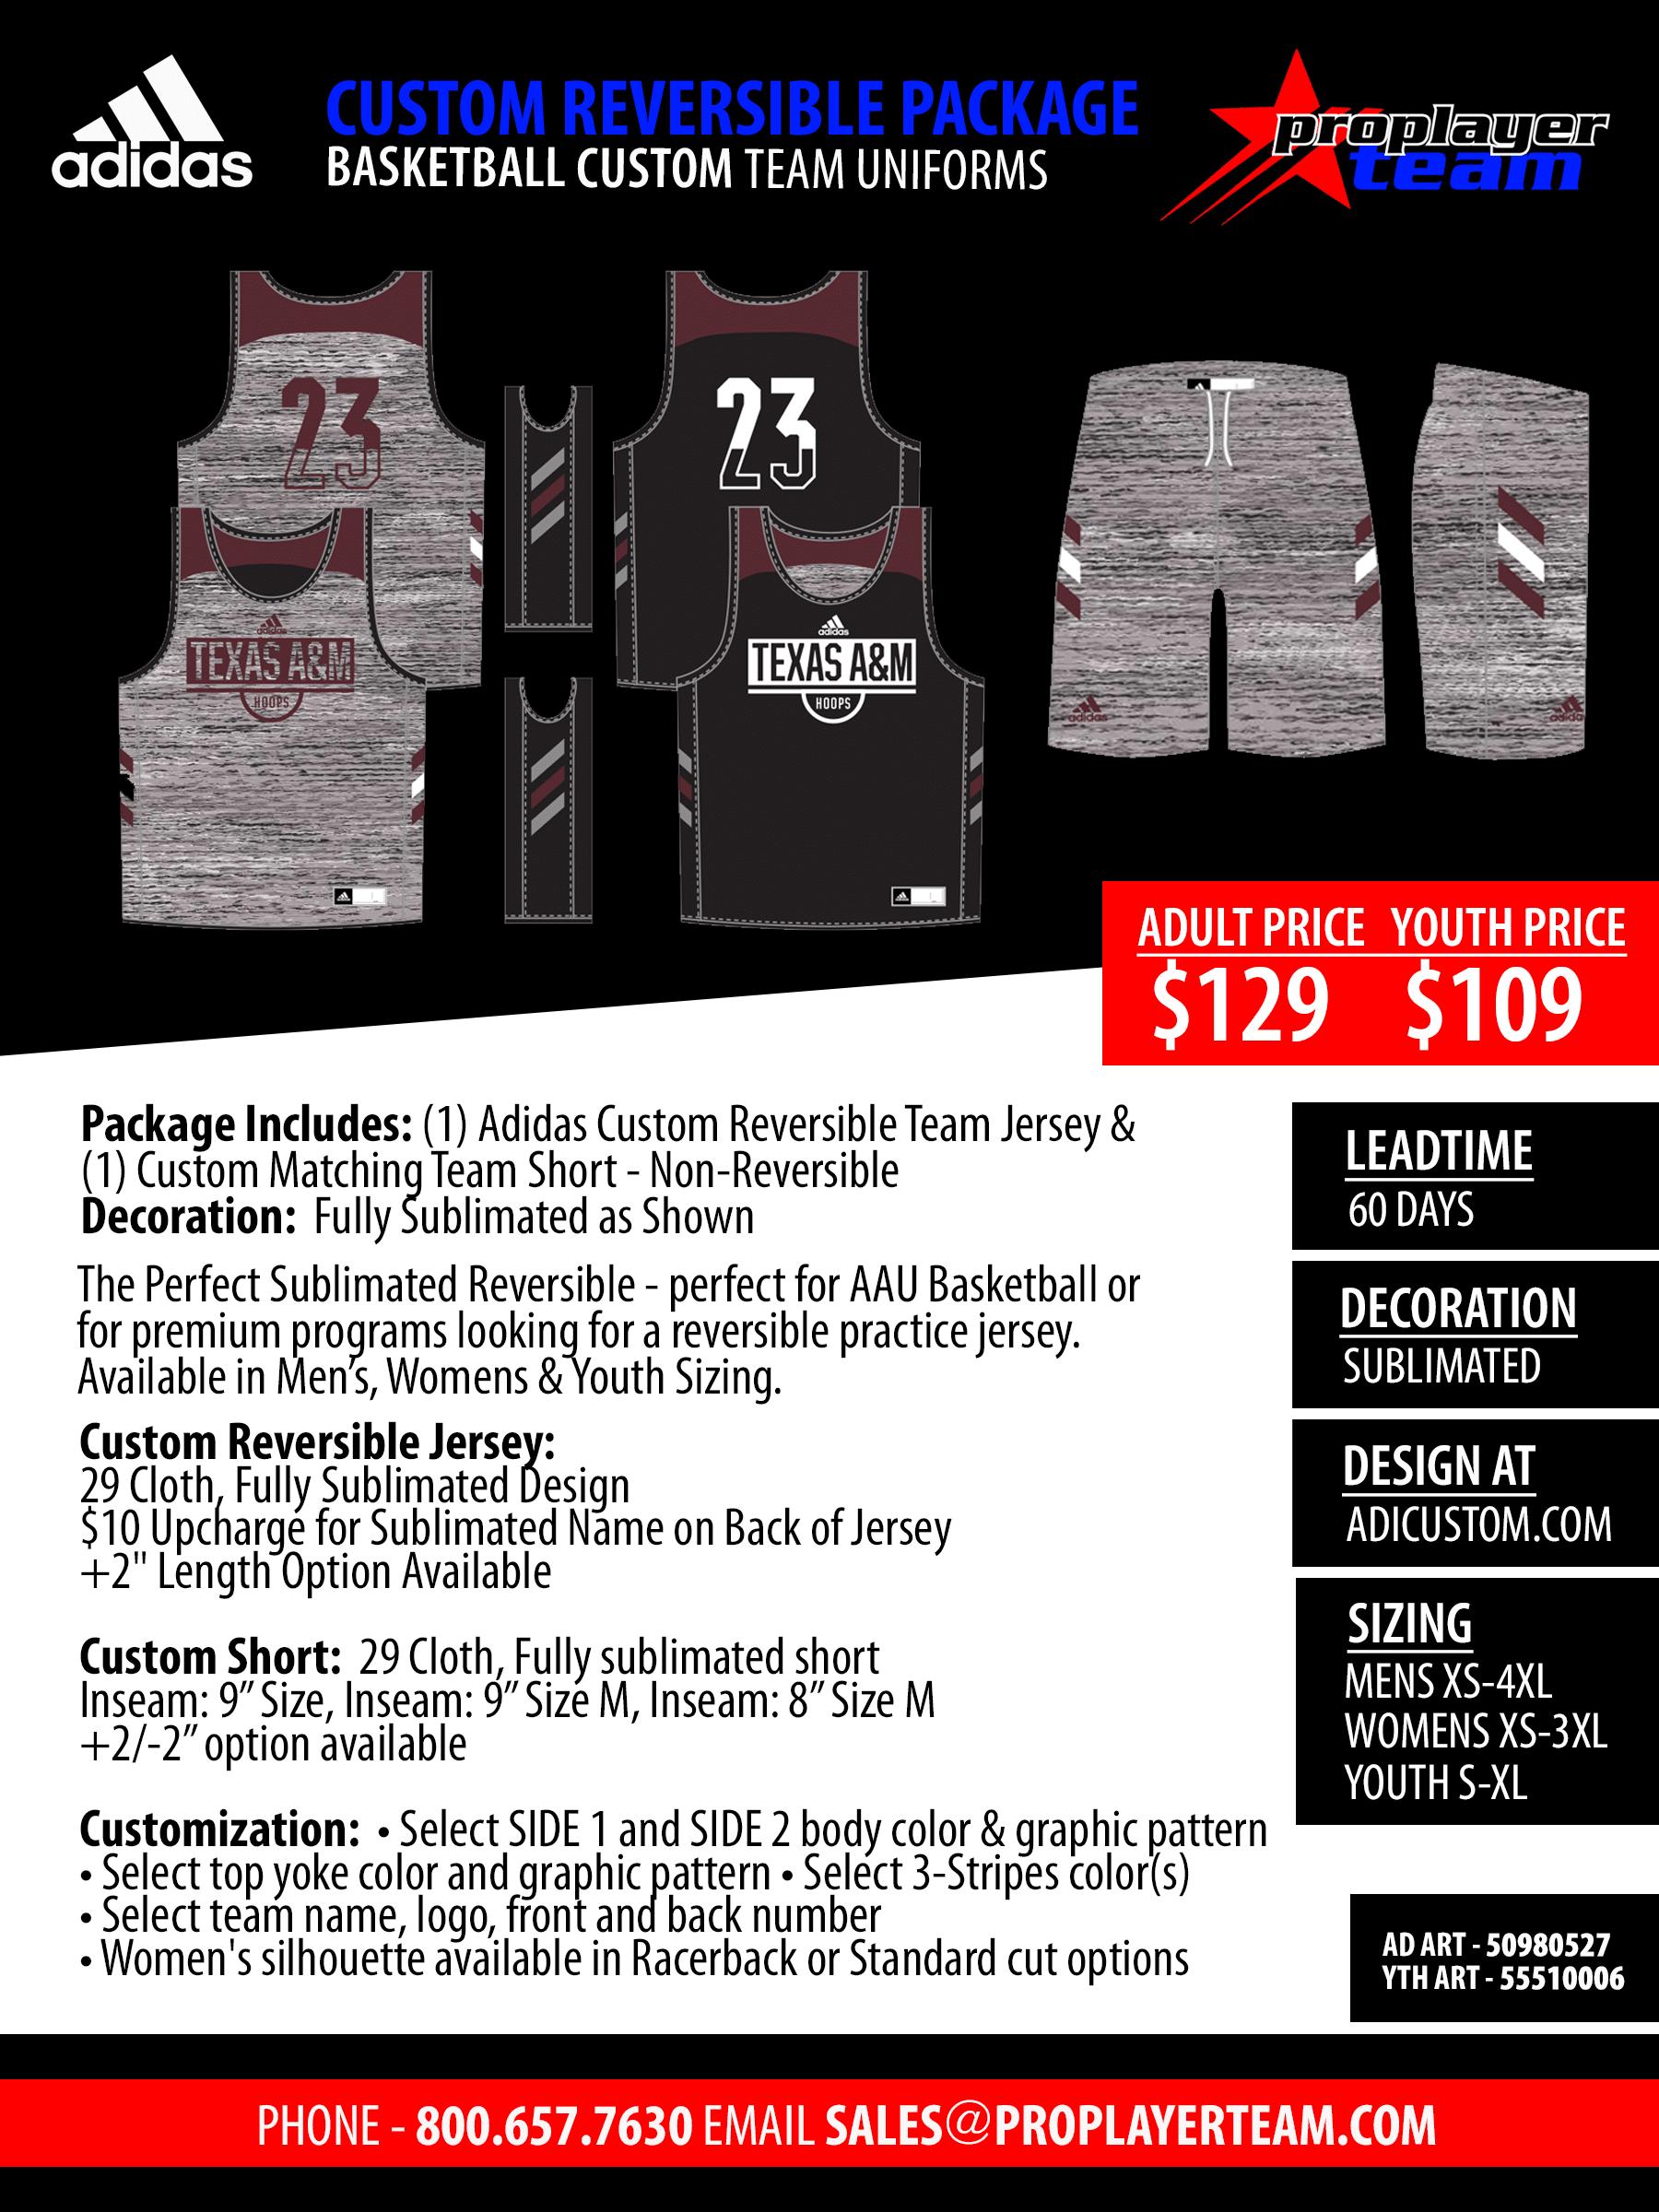 38caf00c8 Adidas Custom Game Changer Basketball Uniform Package - Mens. Custom (60  Days) Click for PDF